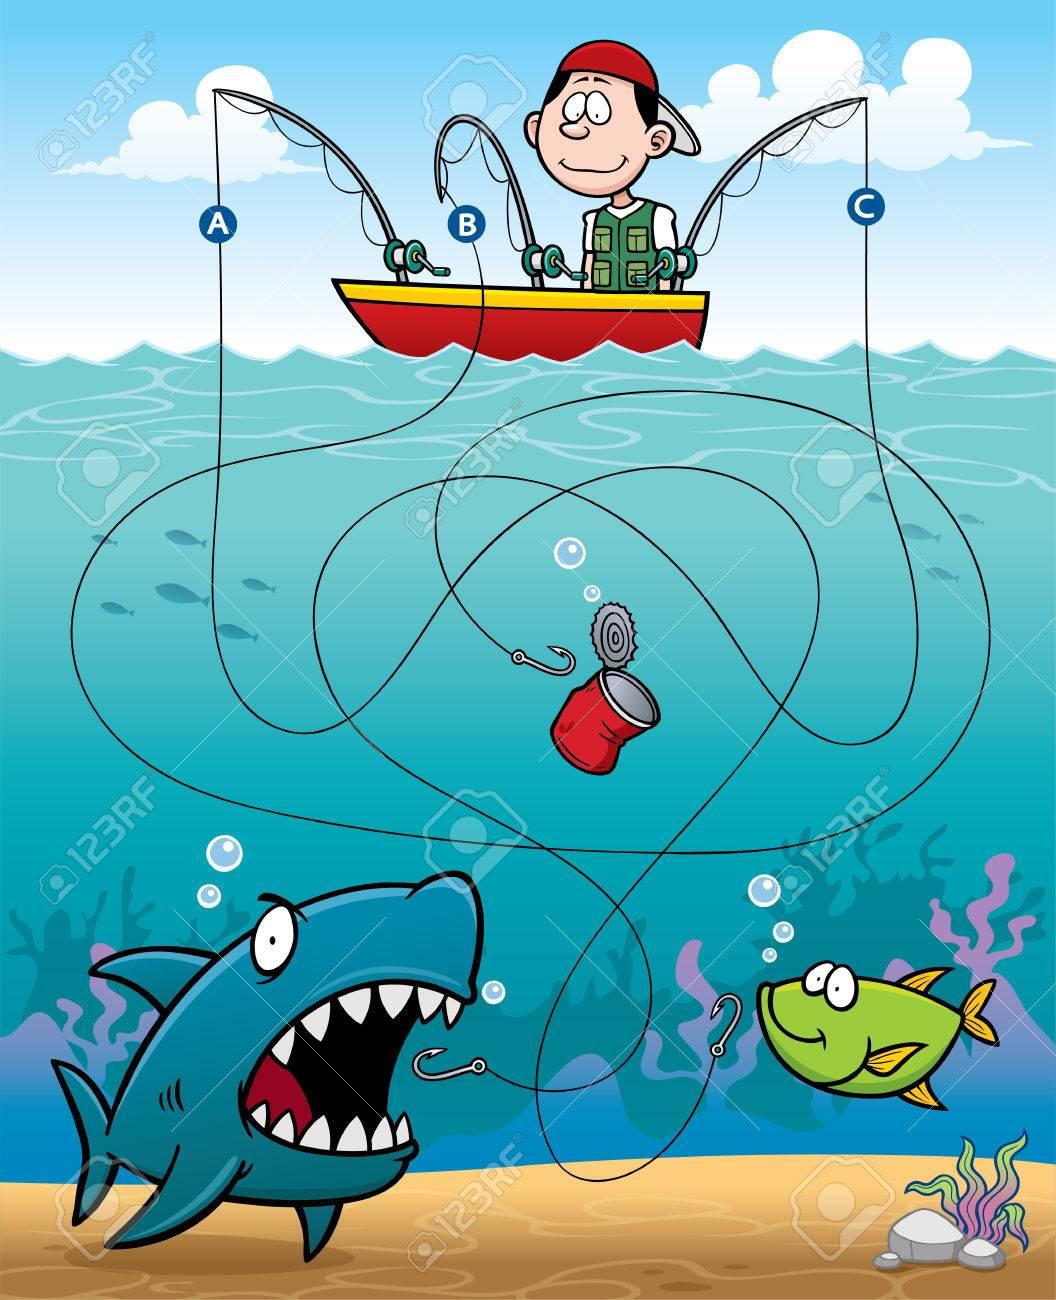 Vector Illustration of Education Fisherman Maze Game - 44035914